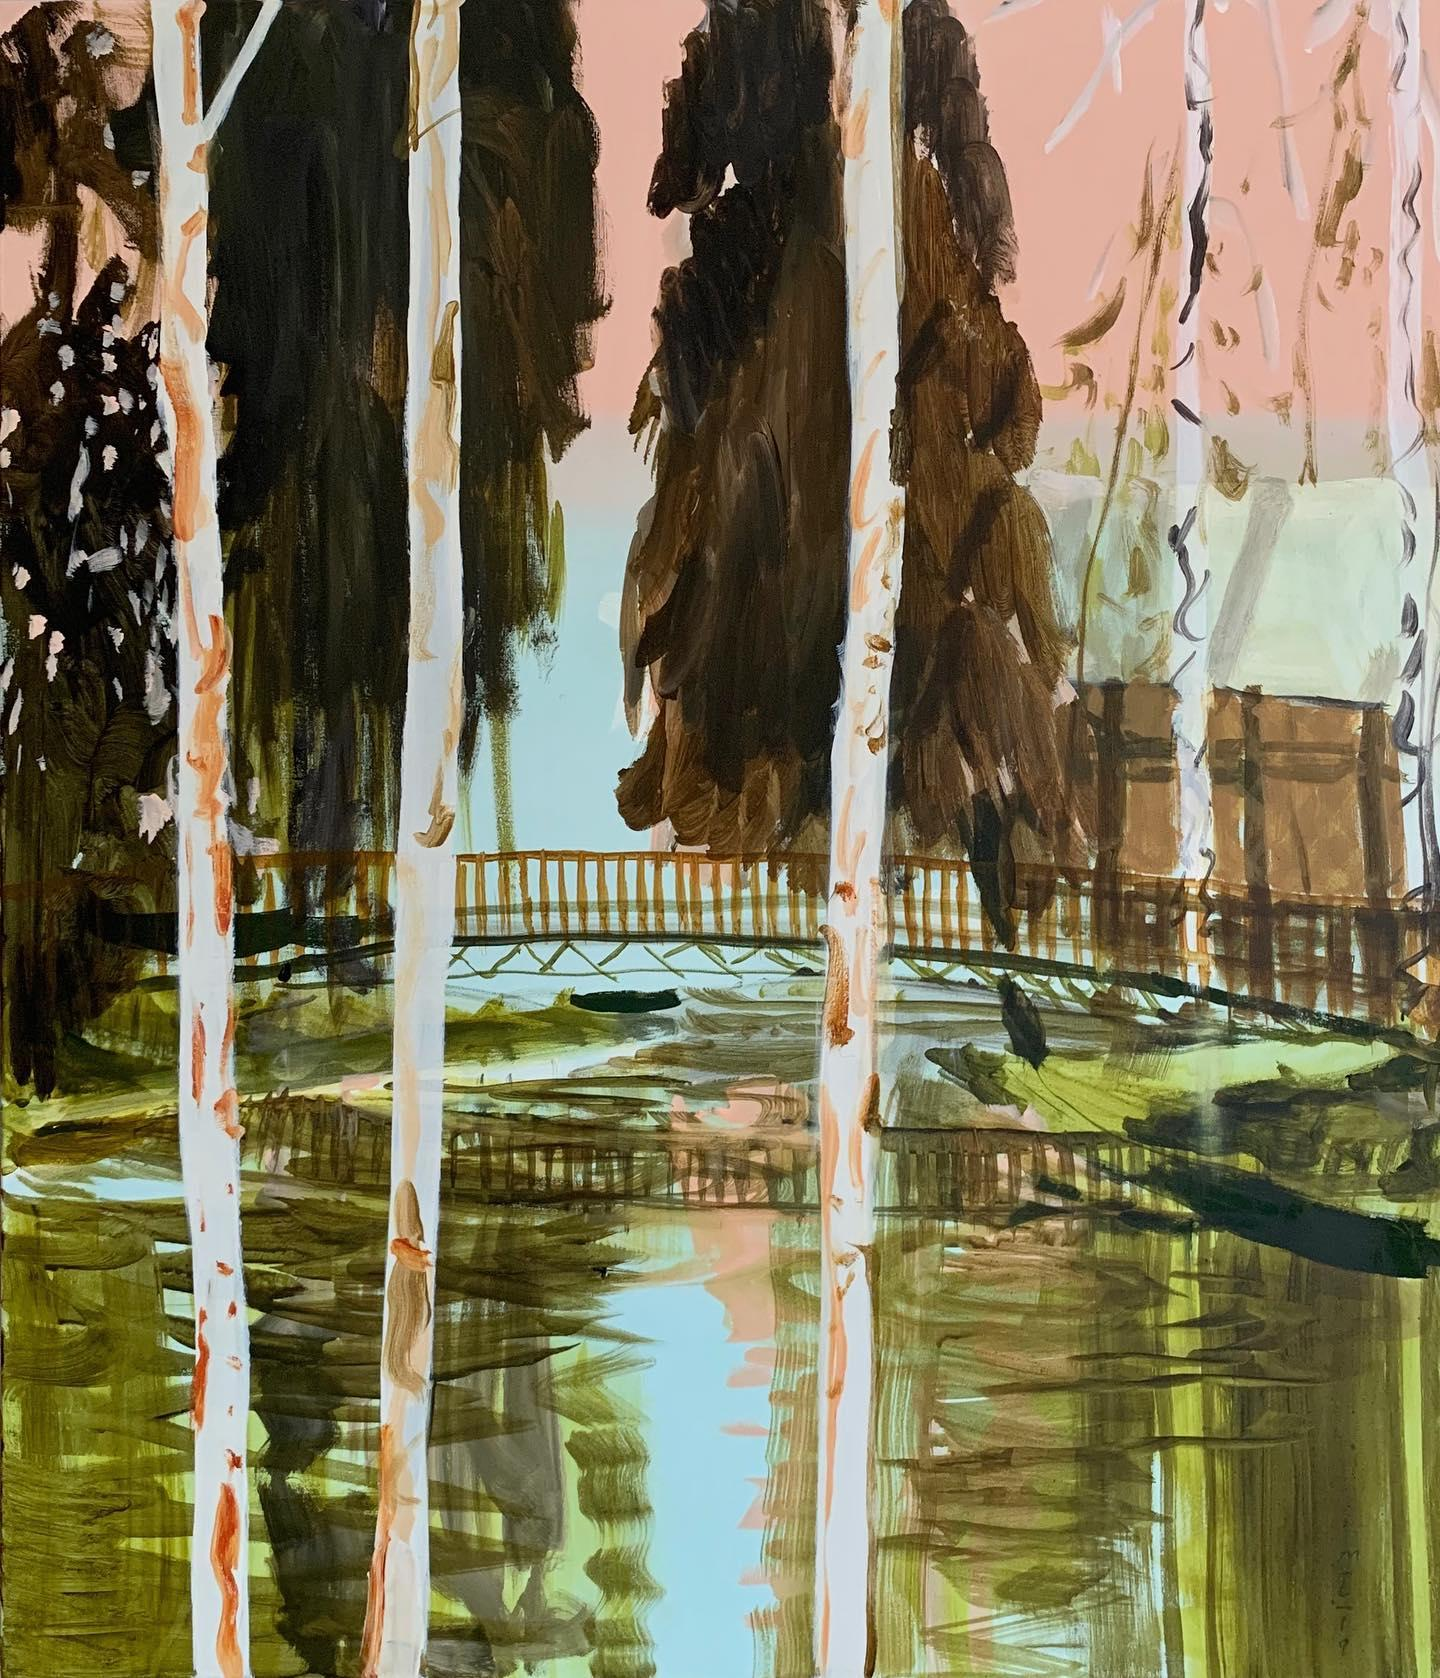 'The Wandering Panda', Contemporary figurative landscape acrylic painting